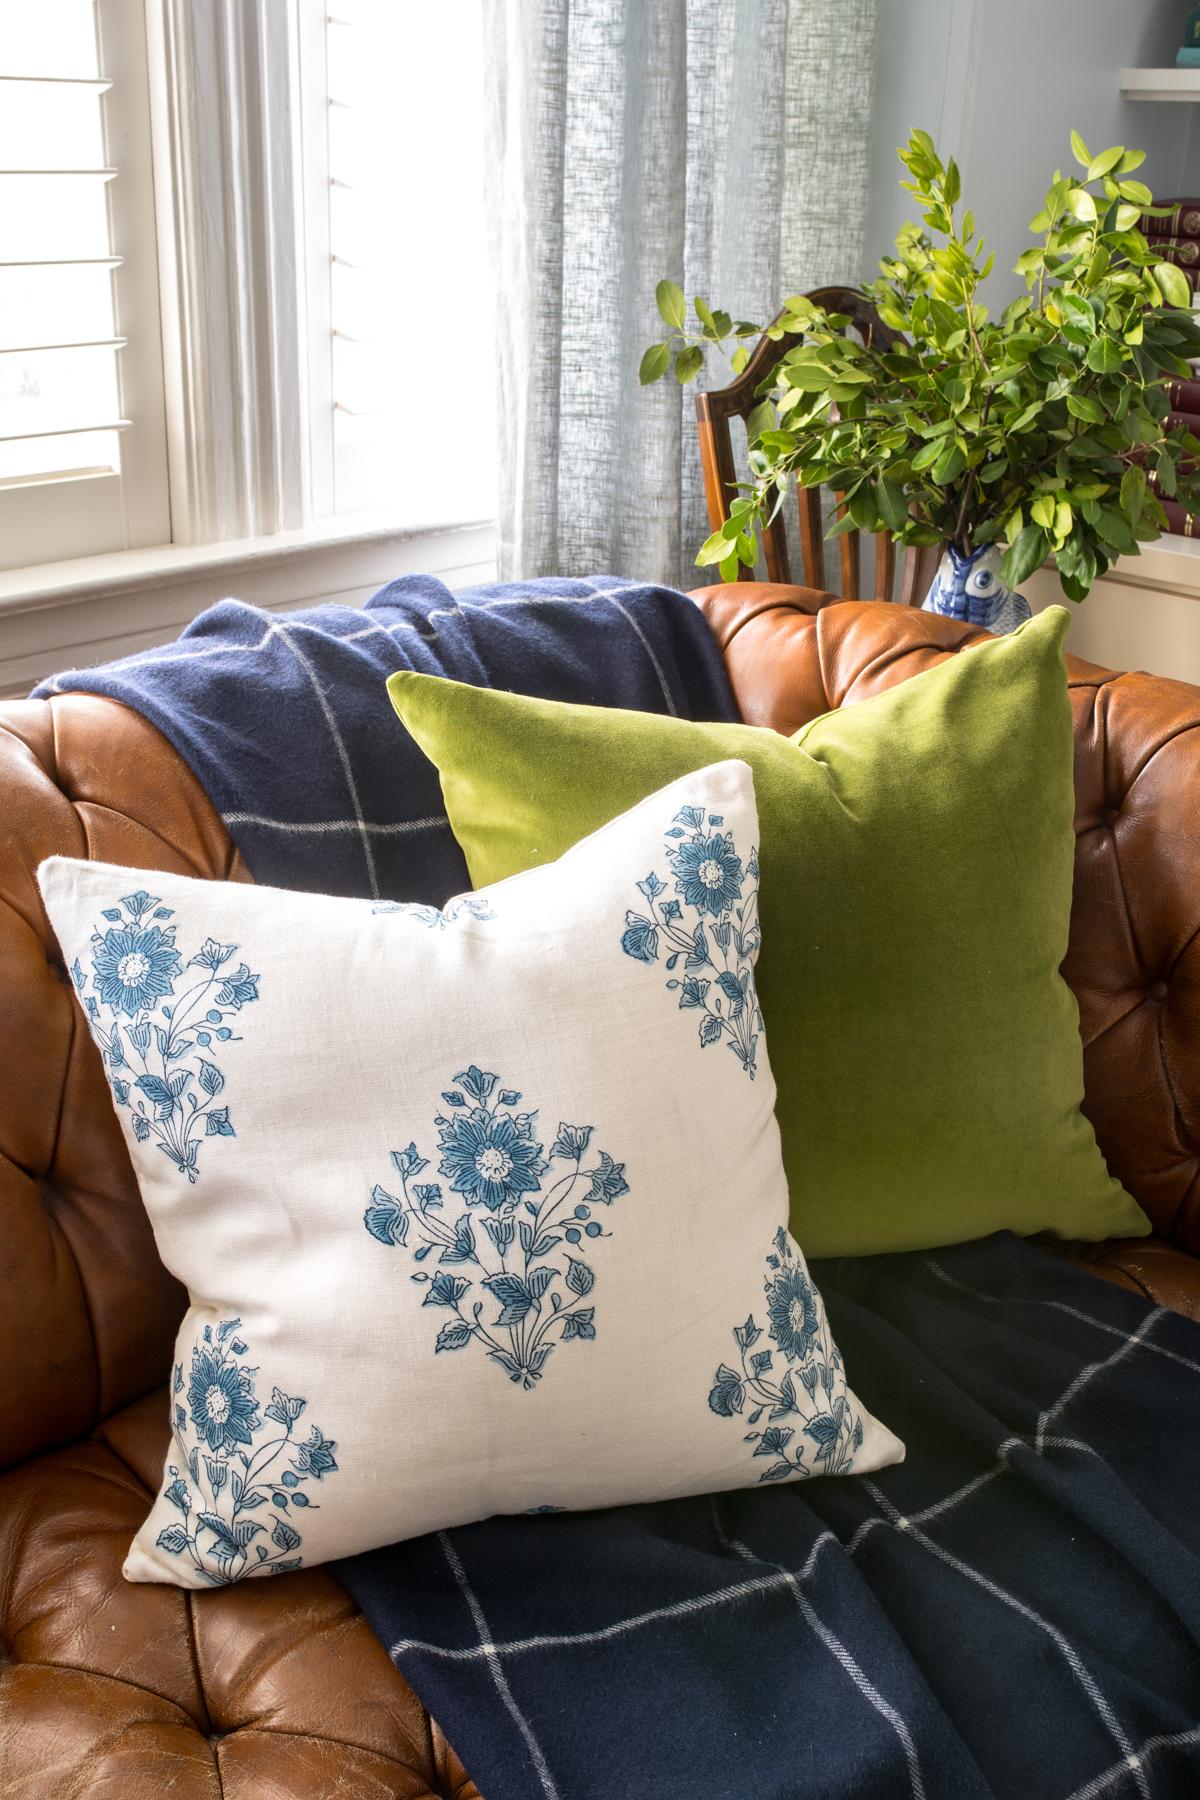 Stacie Flinner Arianna Belle Pillows-10.jpg